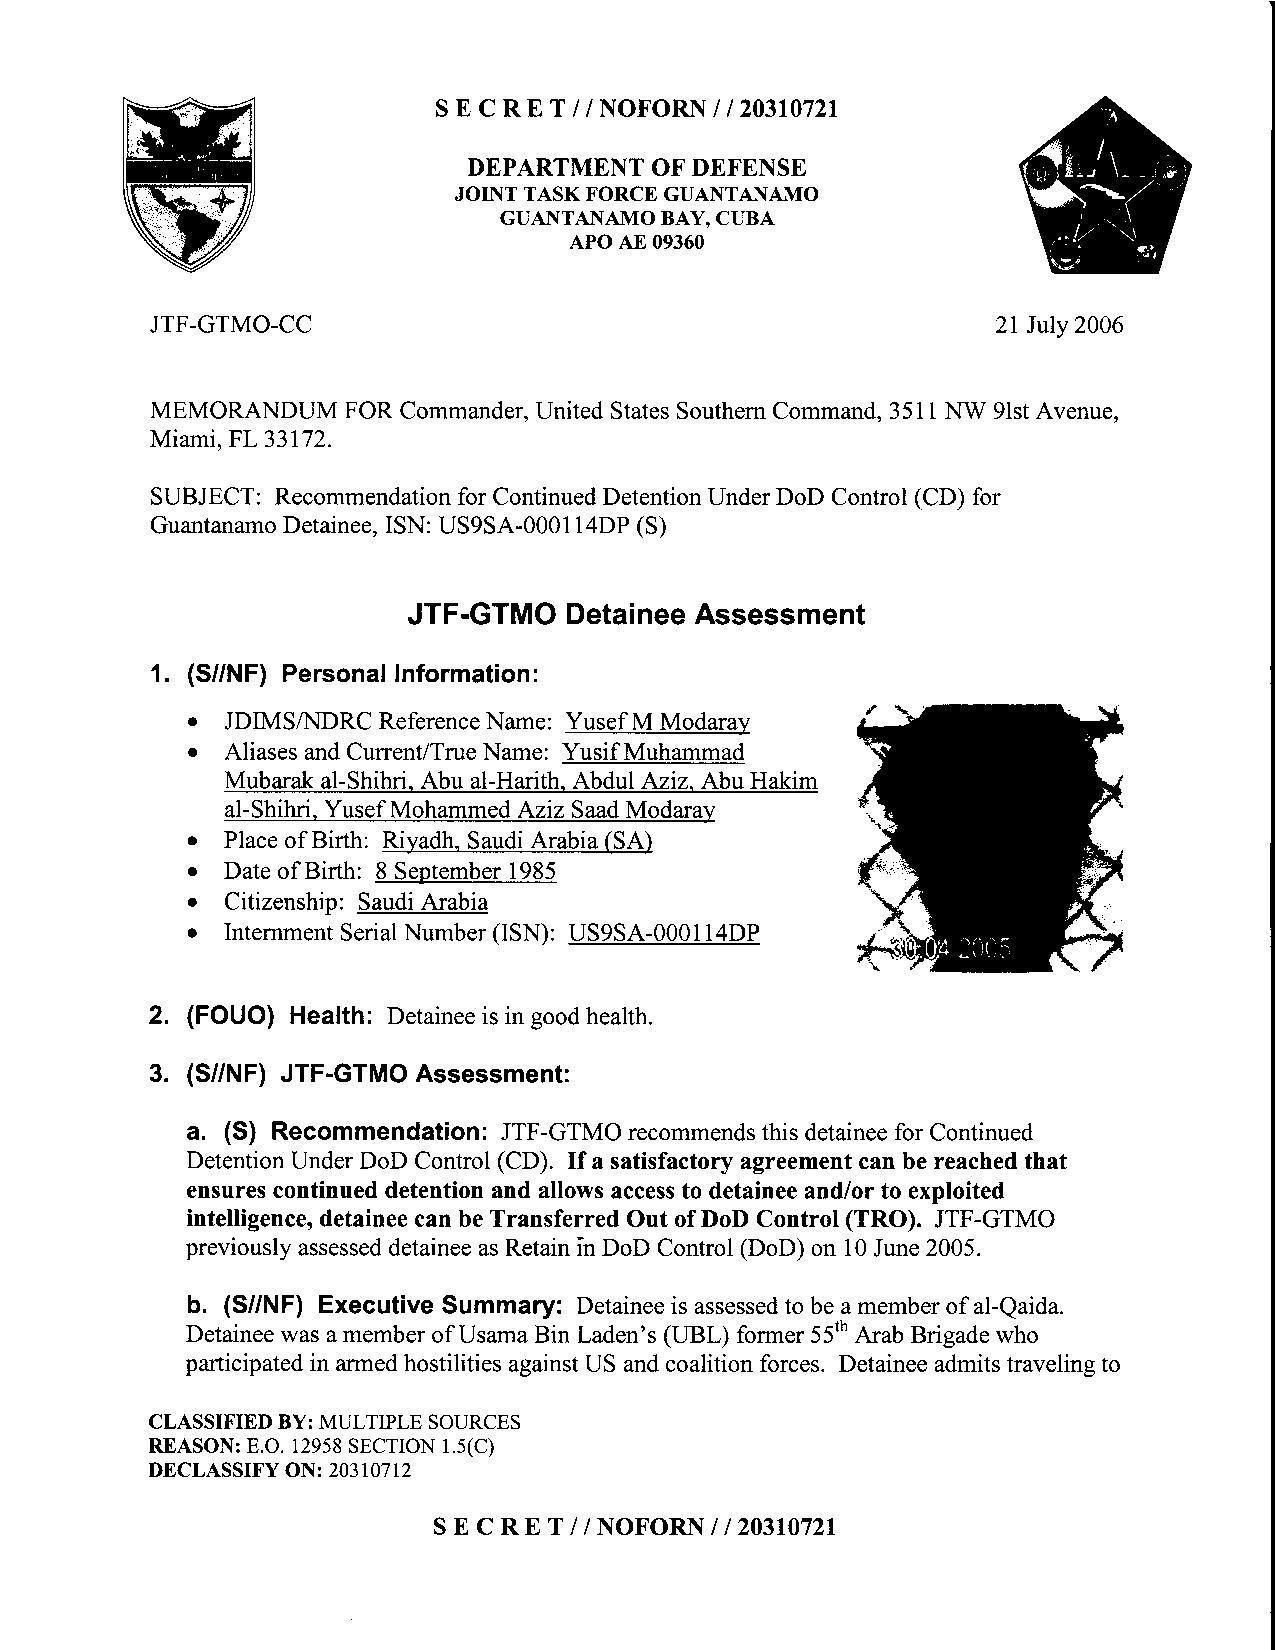 ISN 00114, Yusef M Modaralz's Guantanamo detainee assessment.pdf